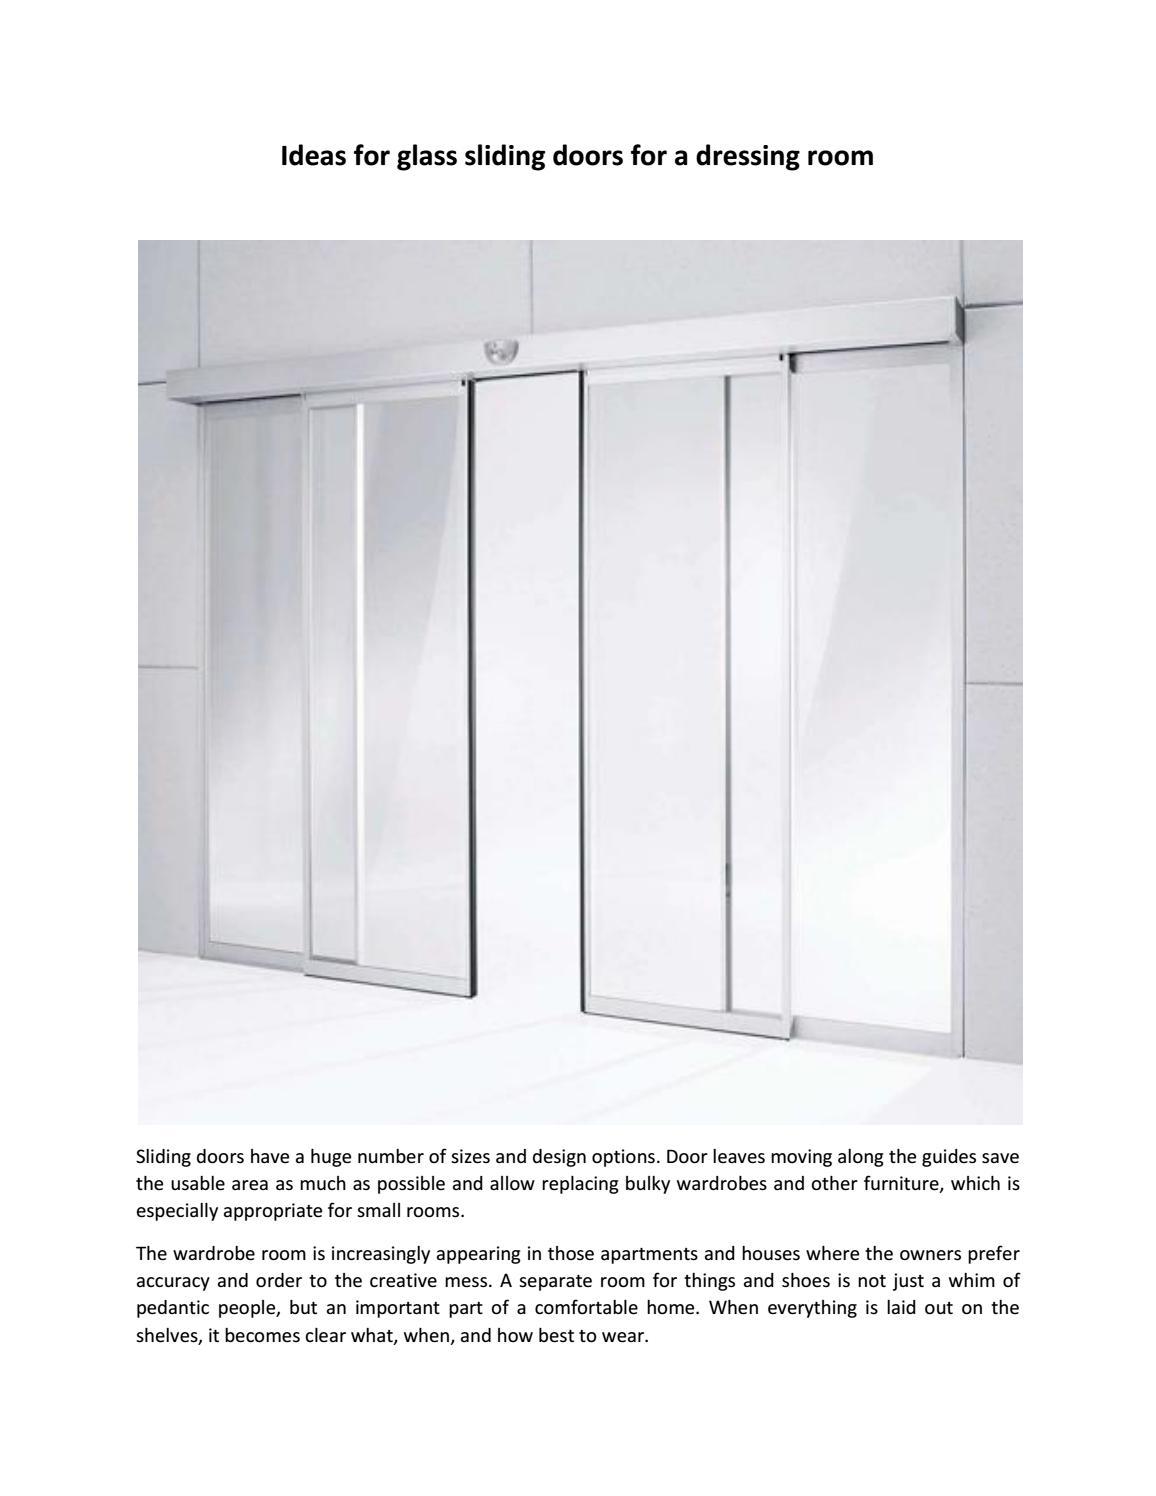 glass sliding doors for a dressing room